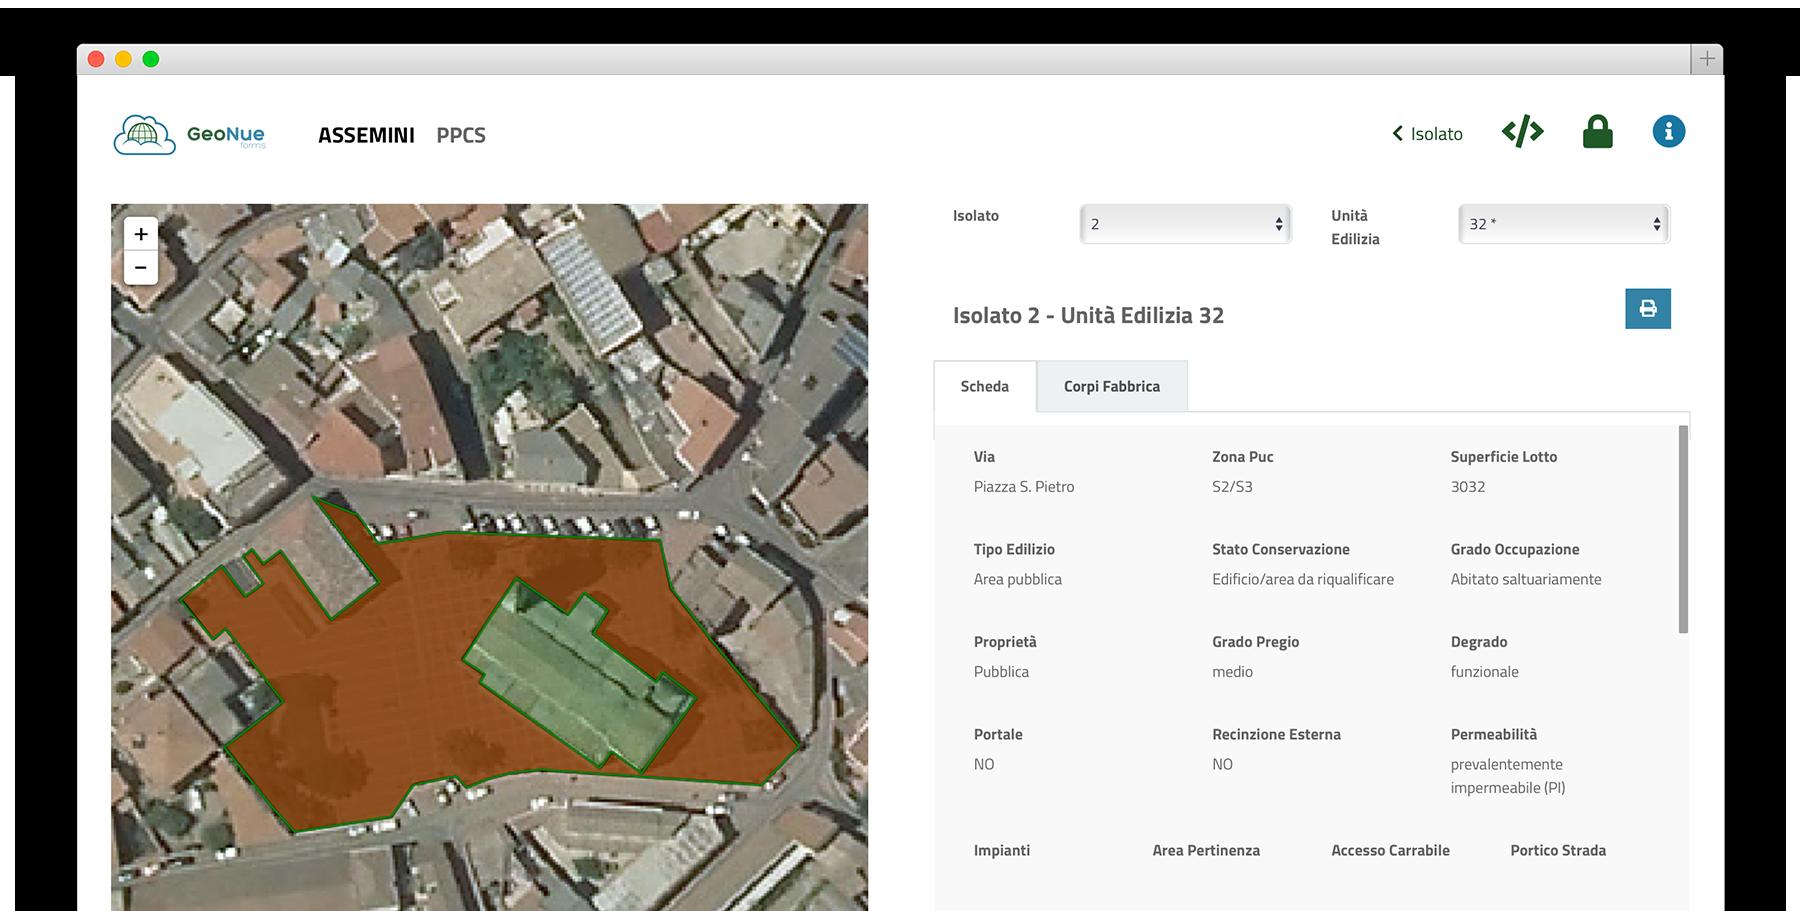 Le mappe dei piani urbanistici